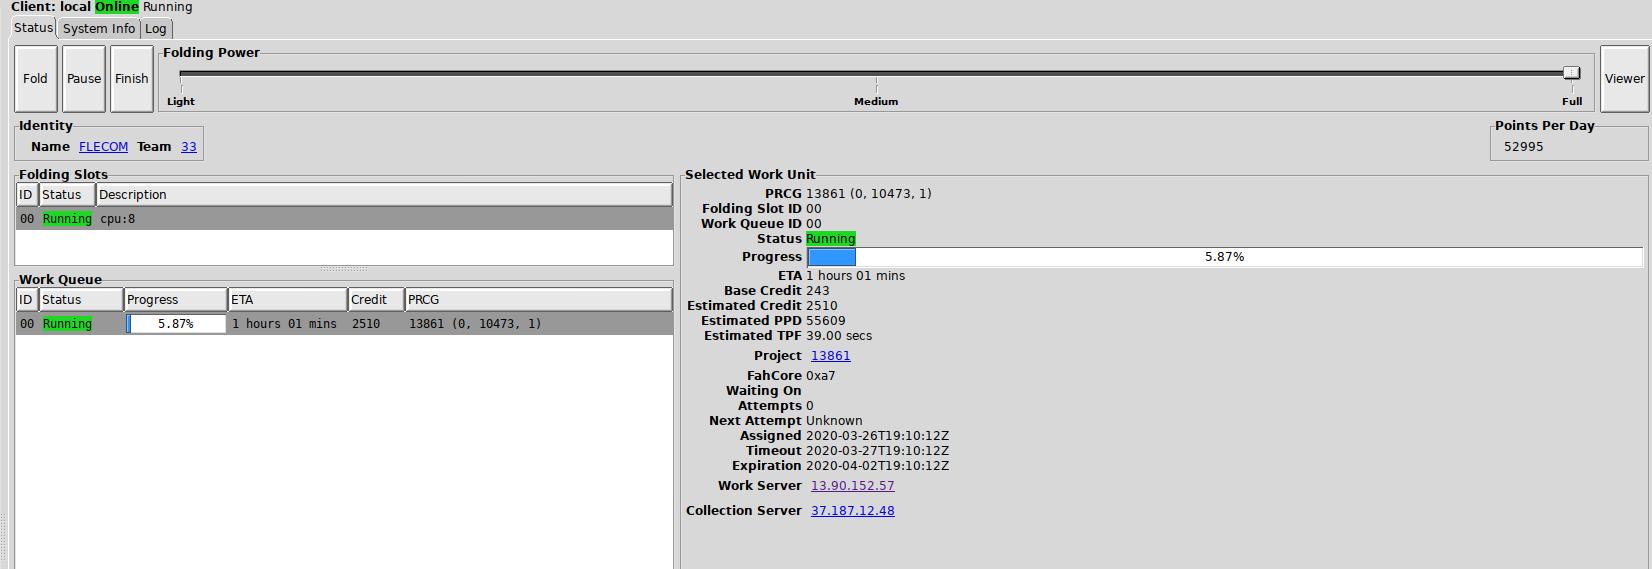 Screenshot_2020-03-26_15-20-00.png